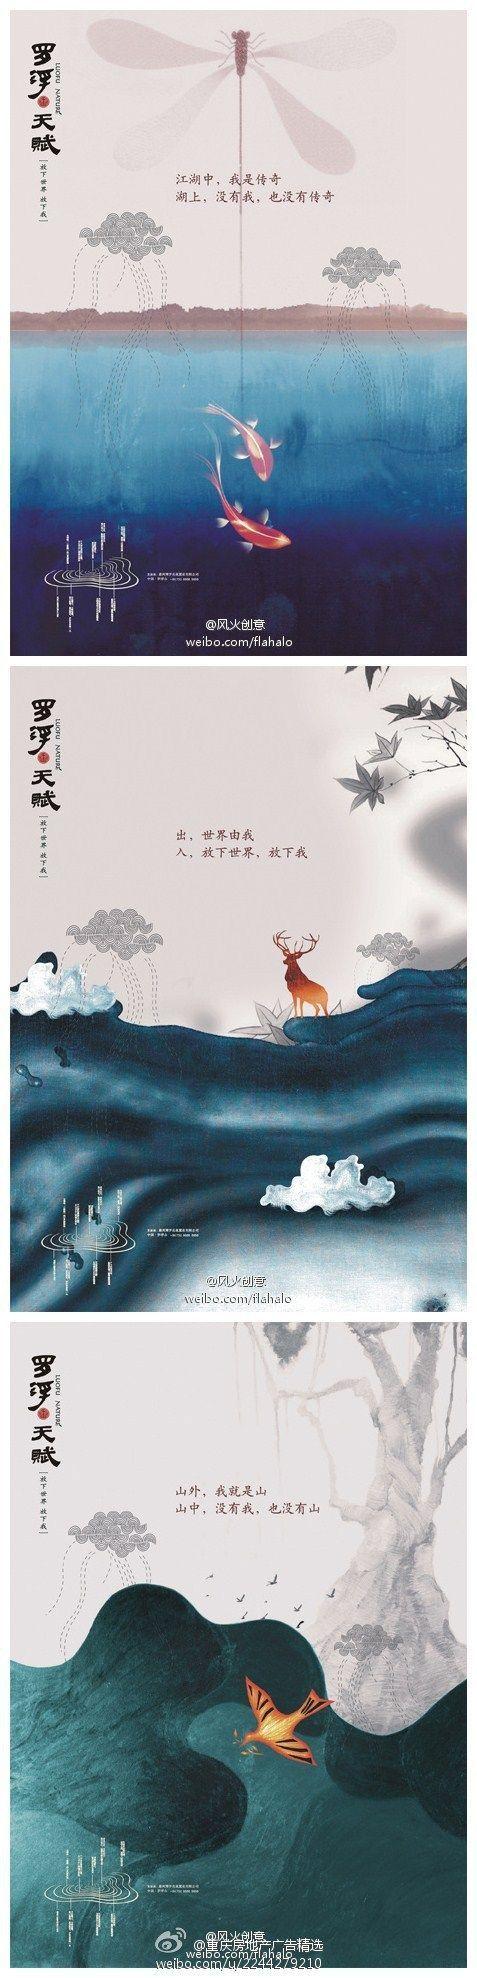 Traditional Japanese style art  重庆房地产广告精选的照片 - 微相册: